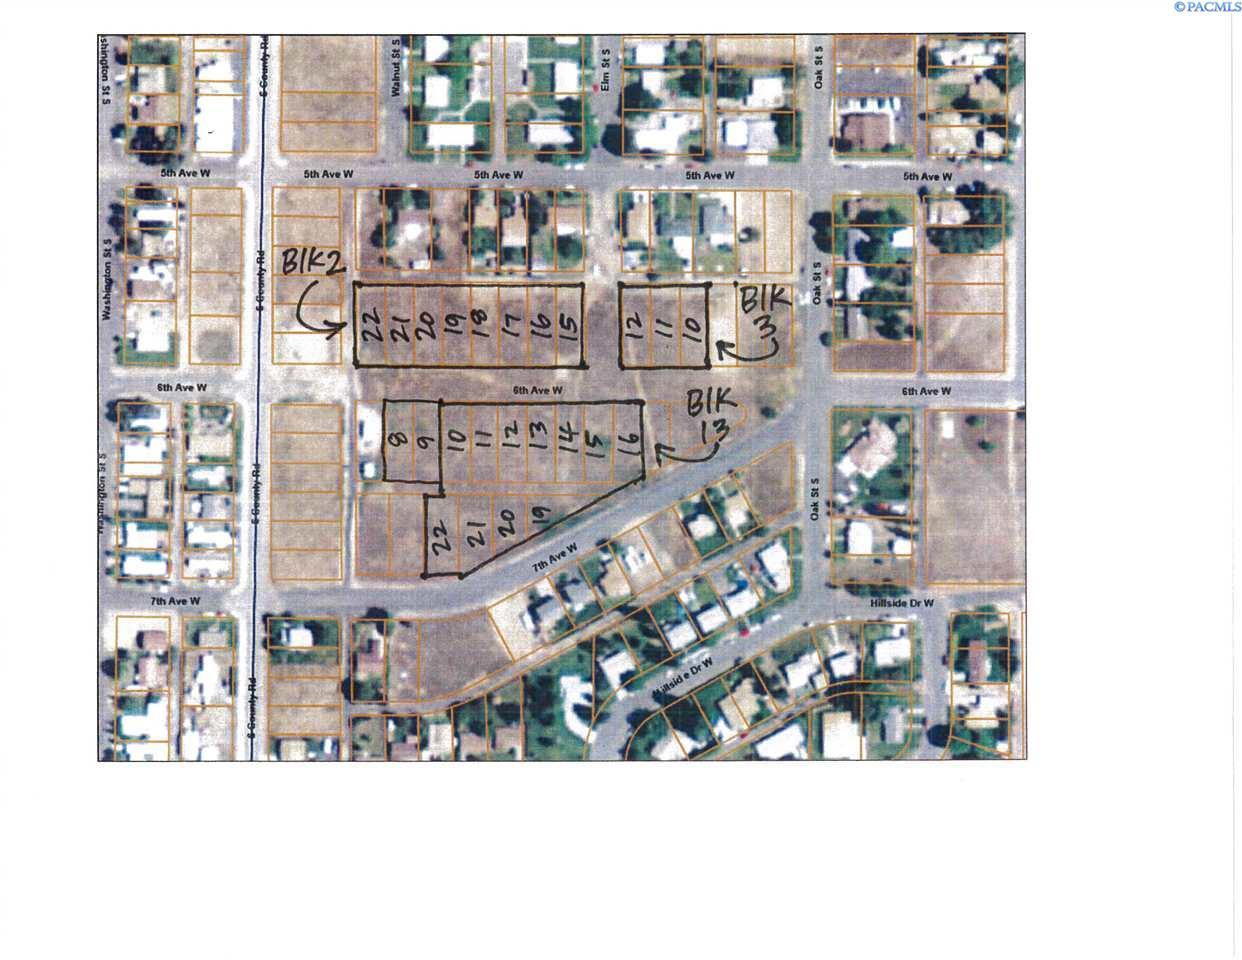 Land / Lots for Sale at 0 S Elm Warden, Washington United States